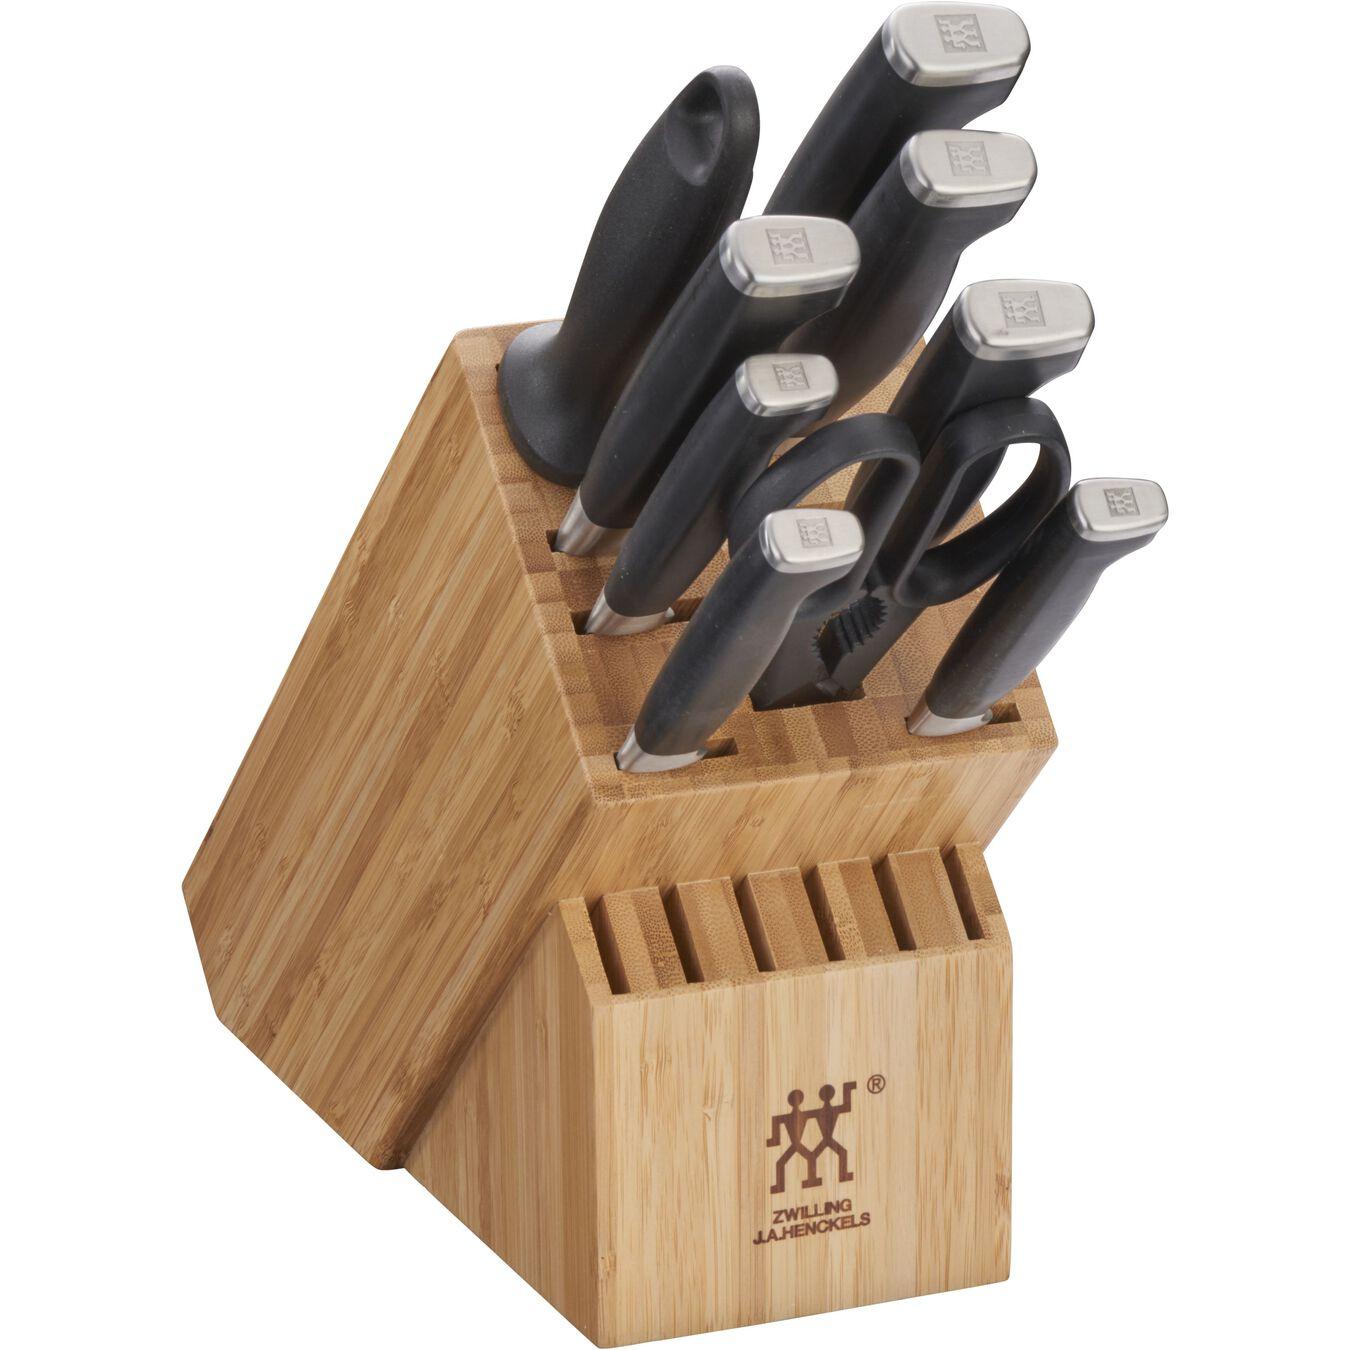 10-pc Knife Block Set,,large 1